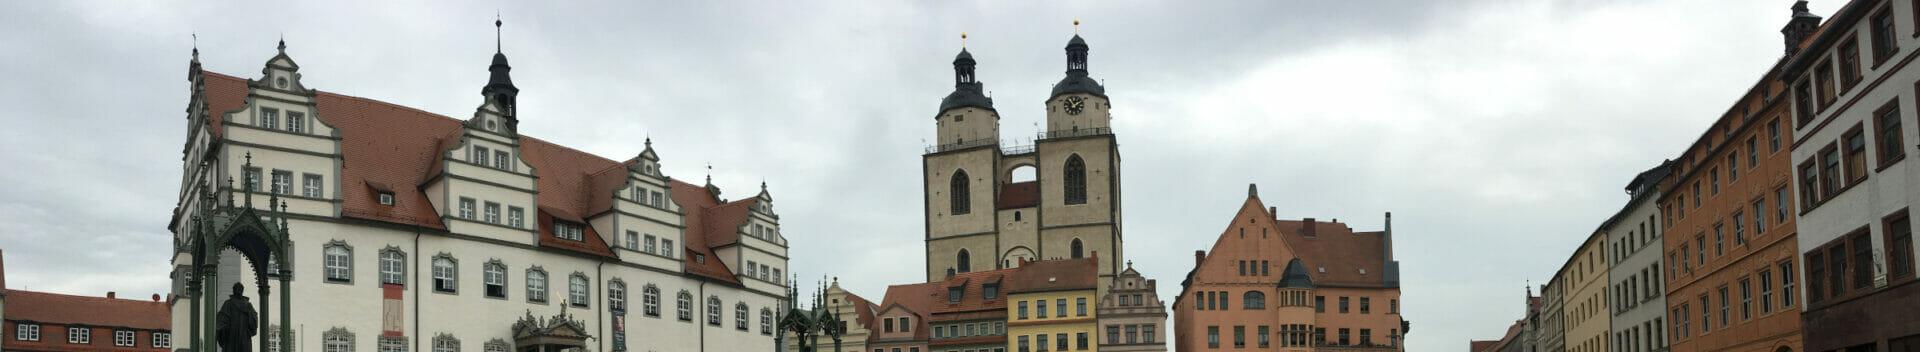 Lutherstadt Wittenberg - Elberadweg - Fläming